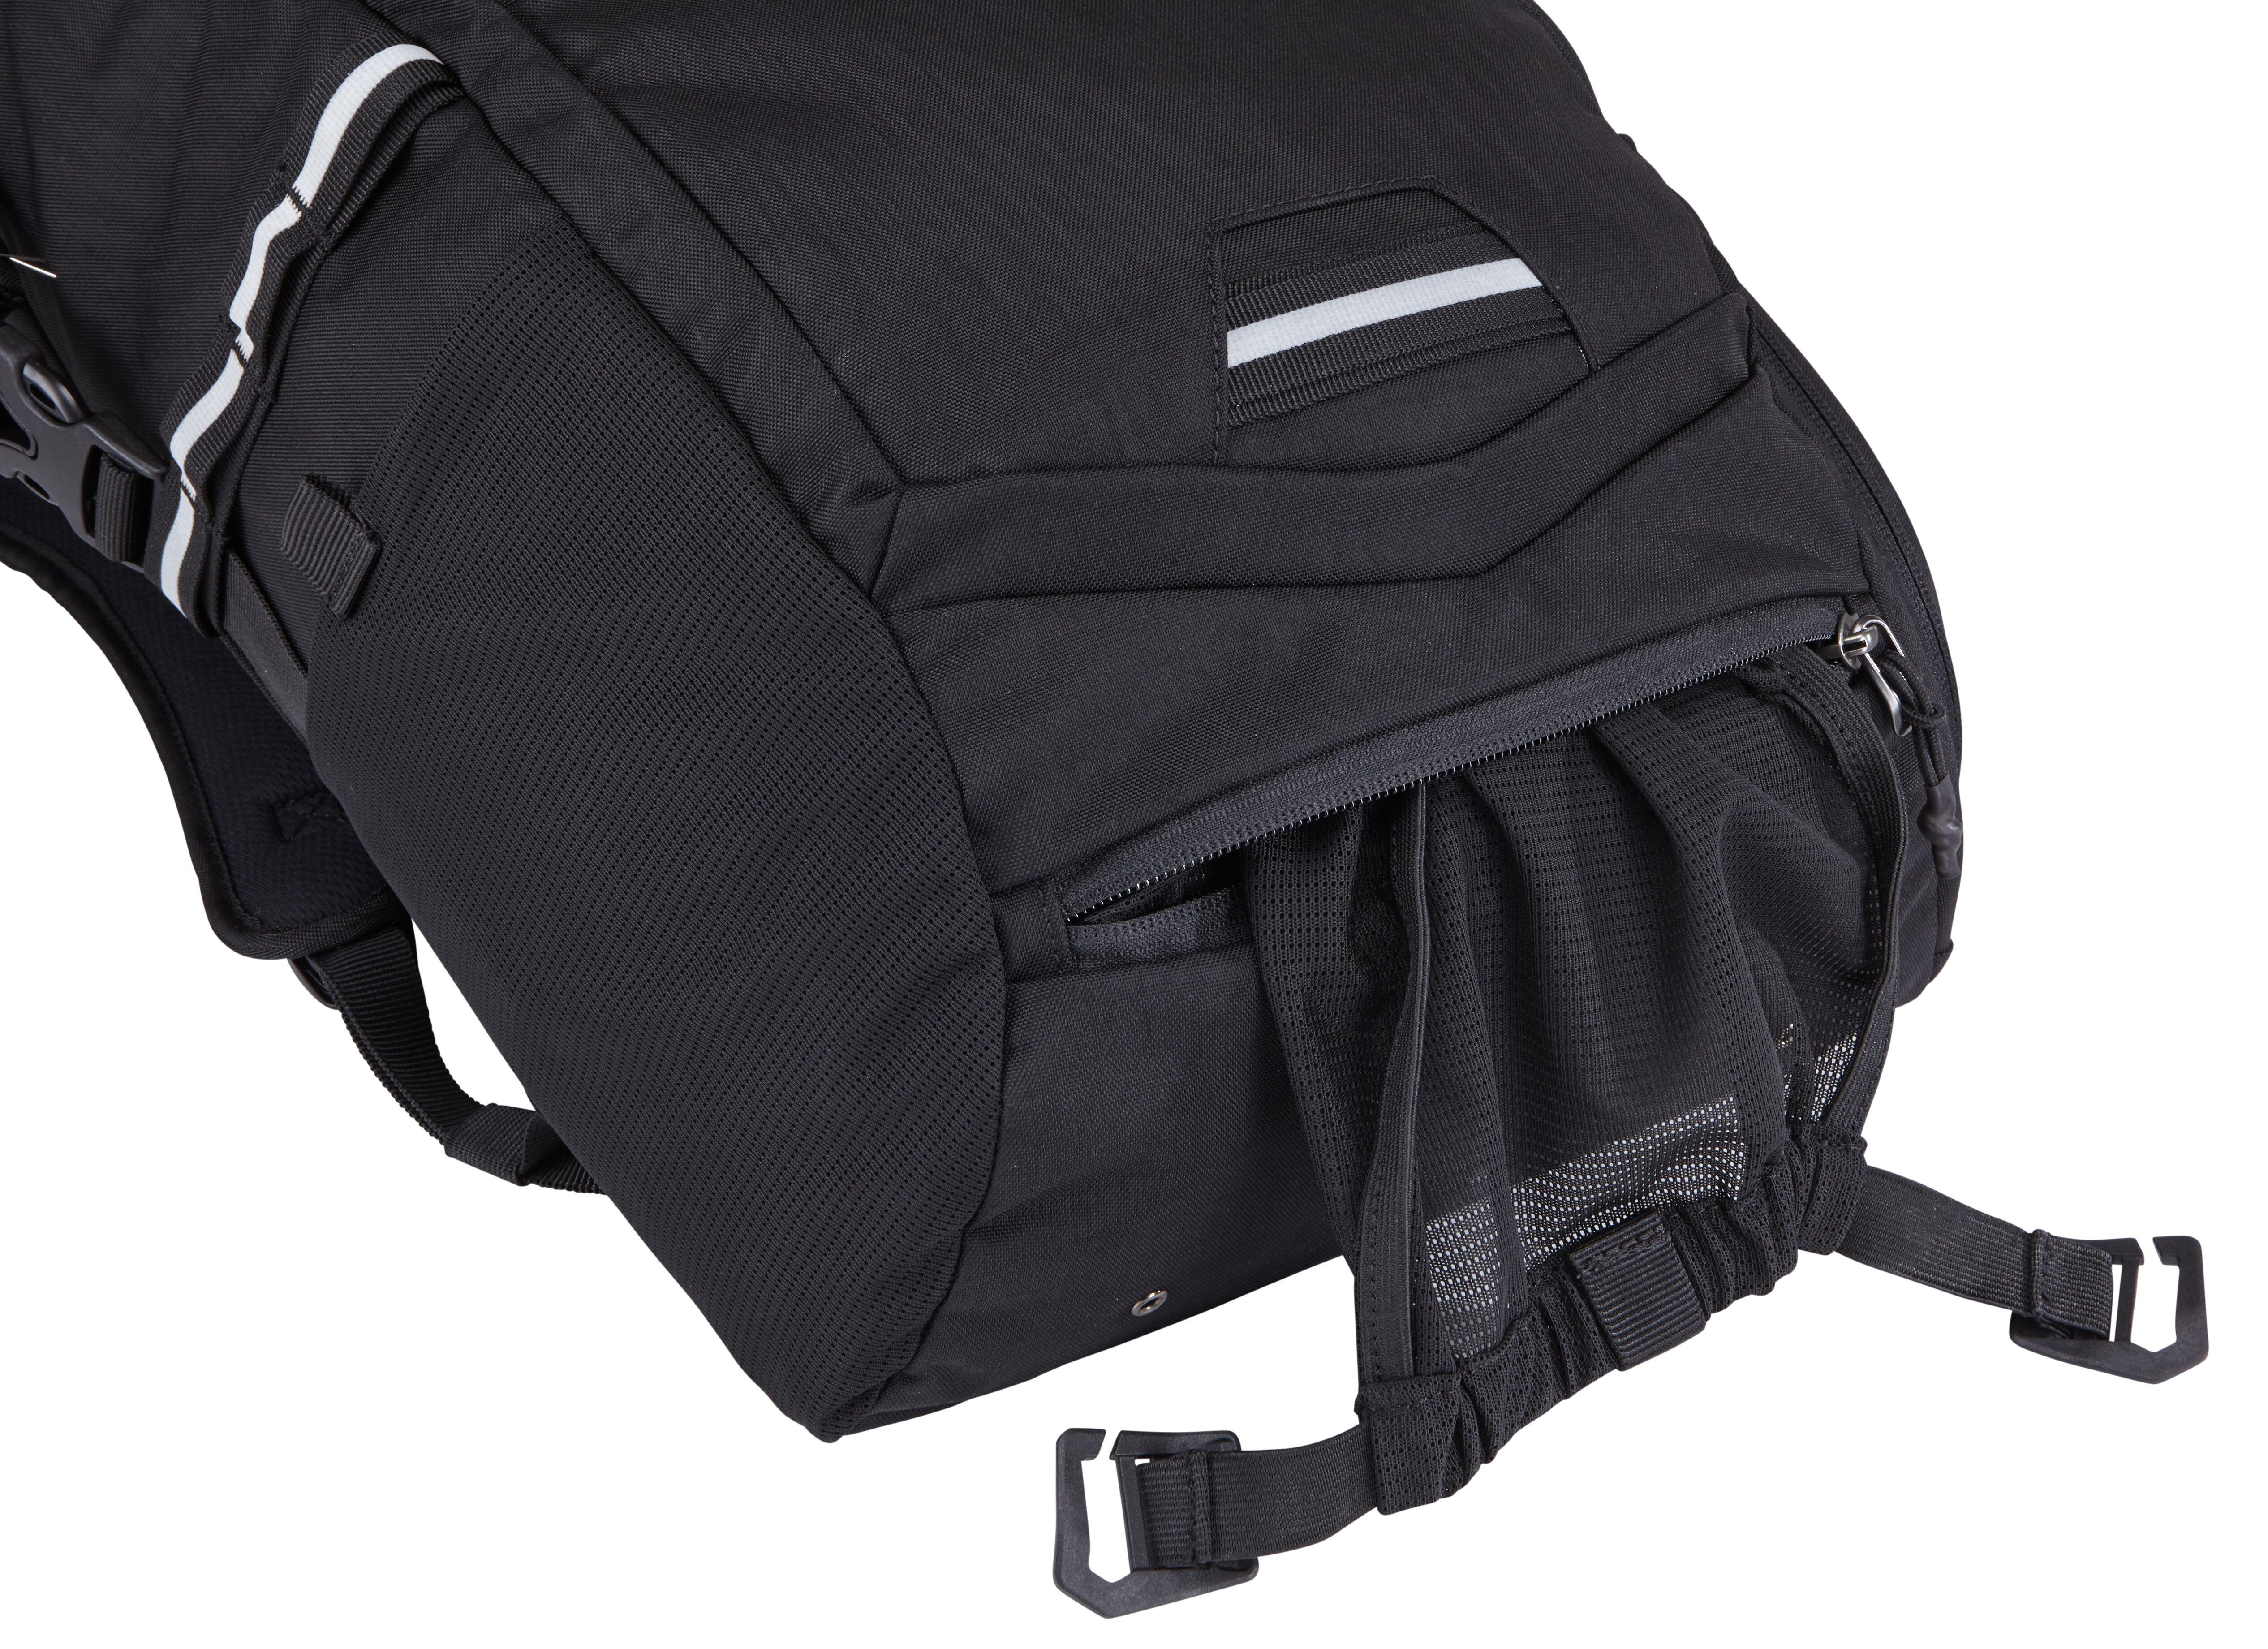 24 Litre Thule Pack/'N Pedal Commuter Bicycle Cycle Bike Backpack Black